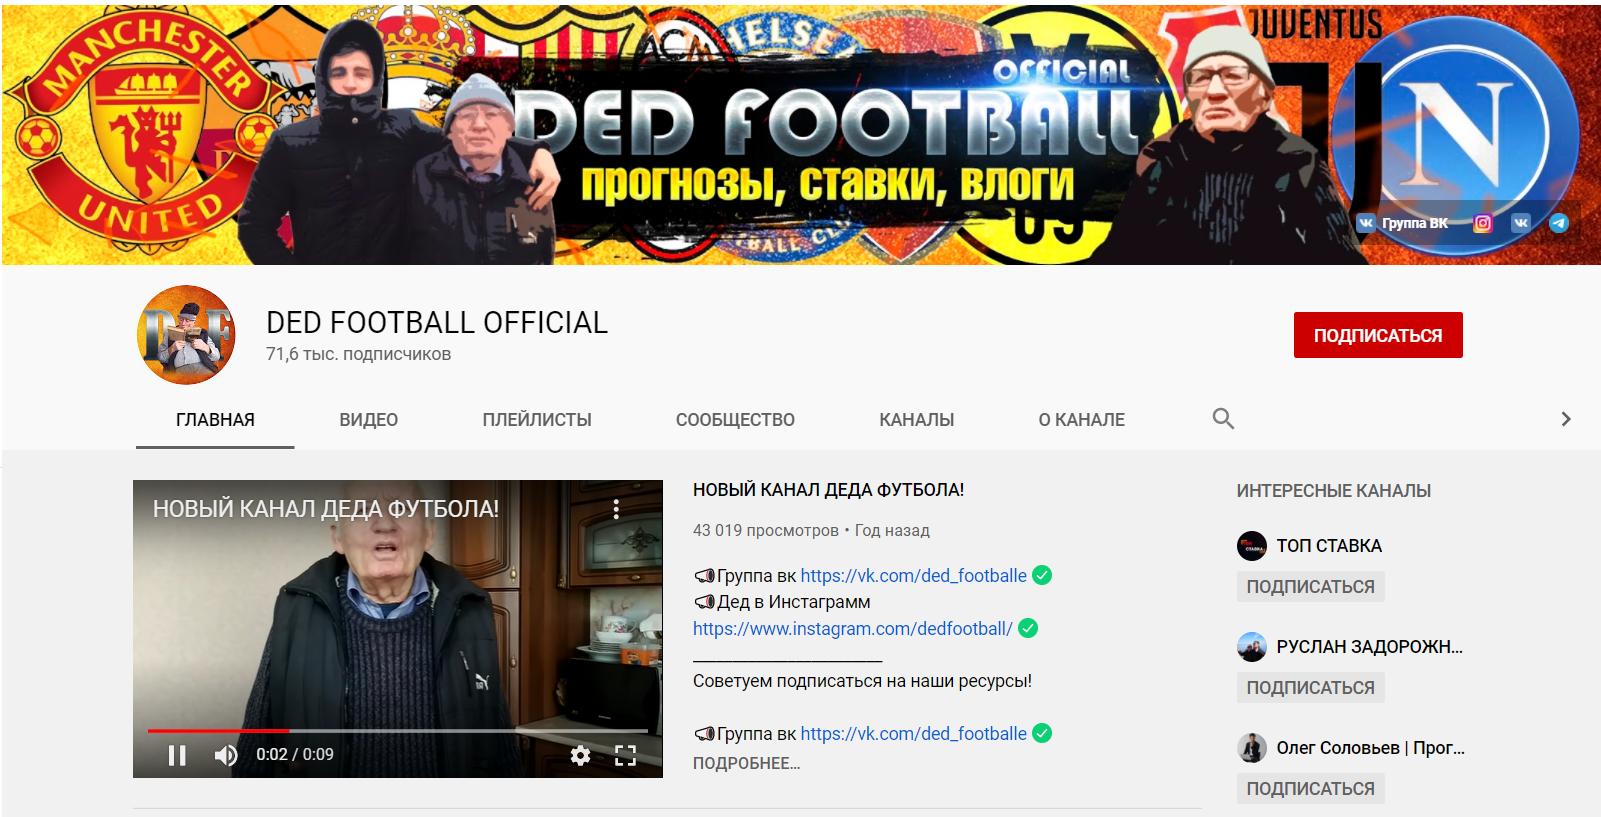 Ютуб канал Дед футбол